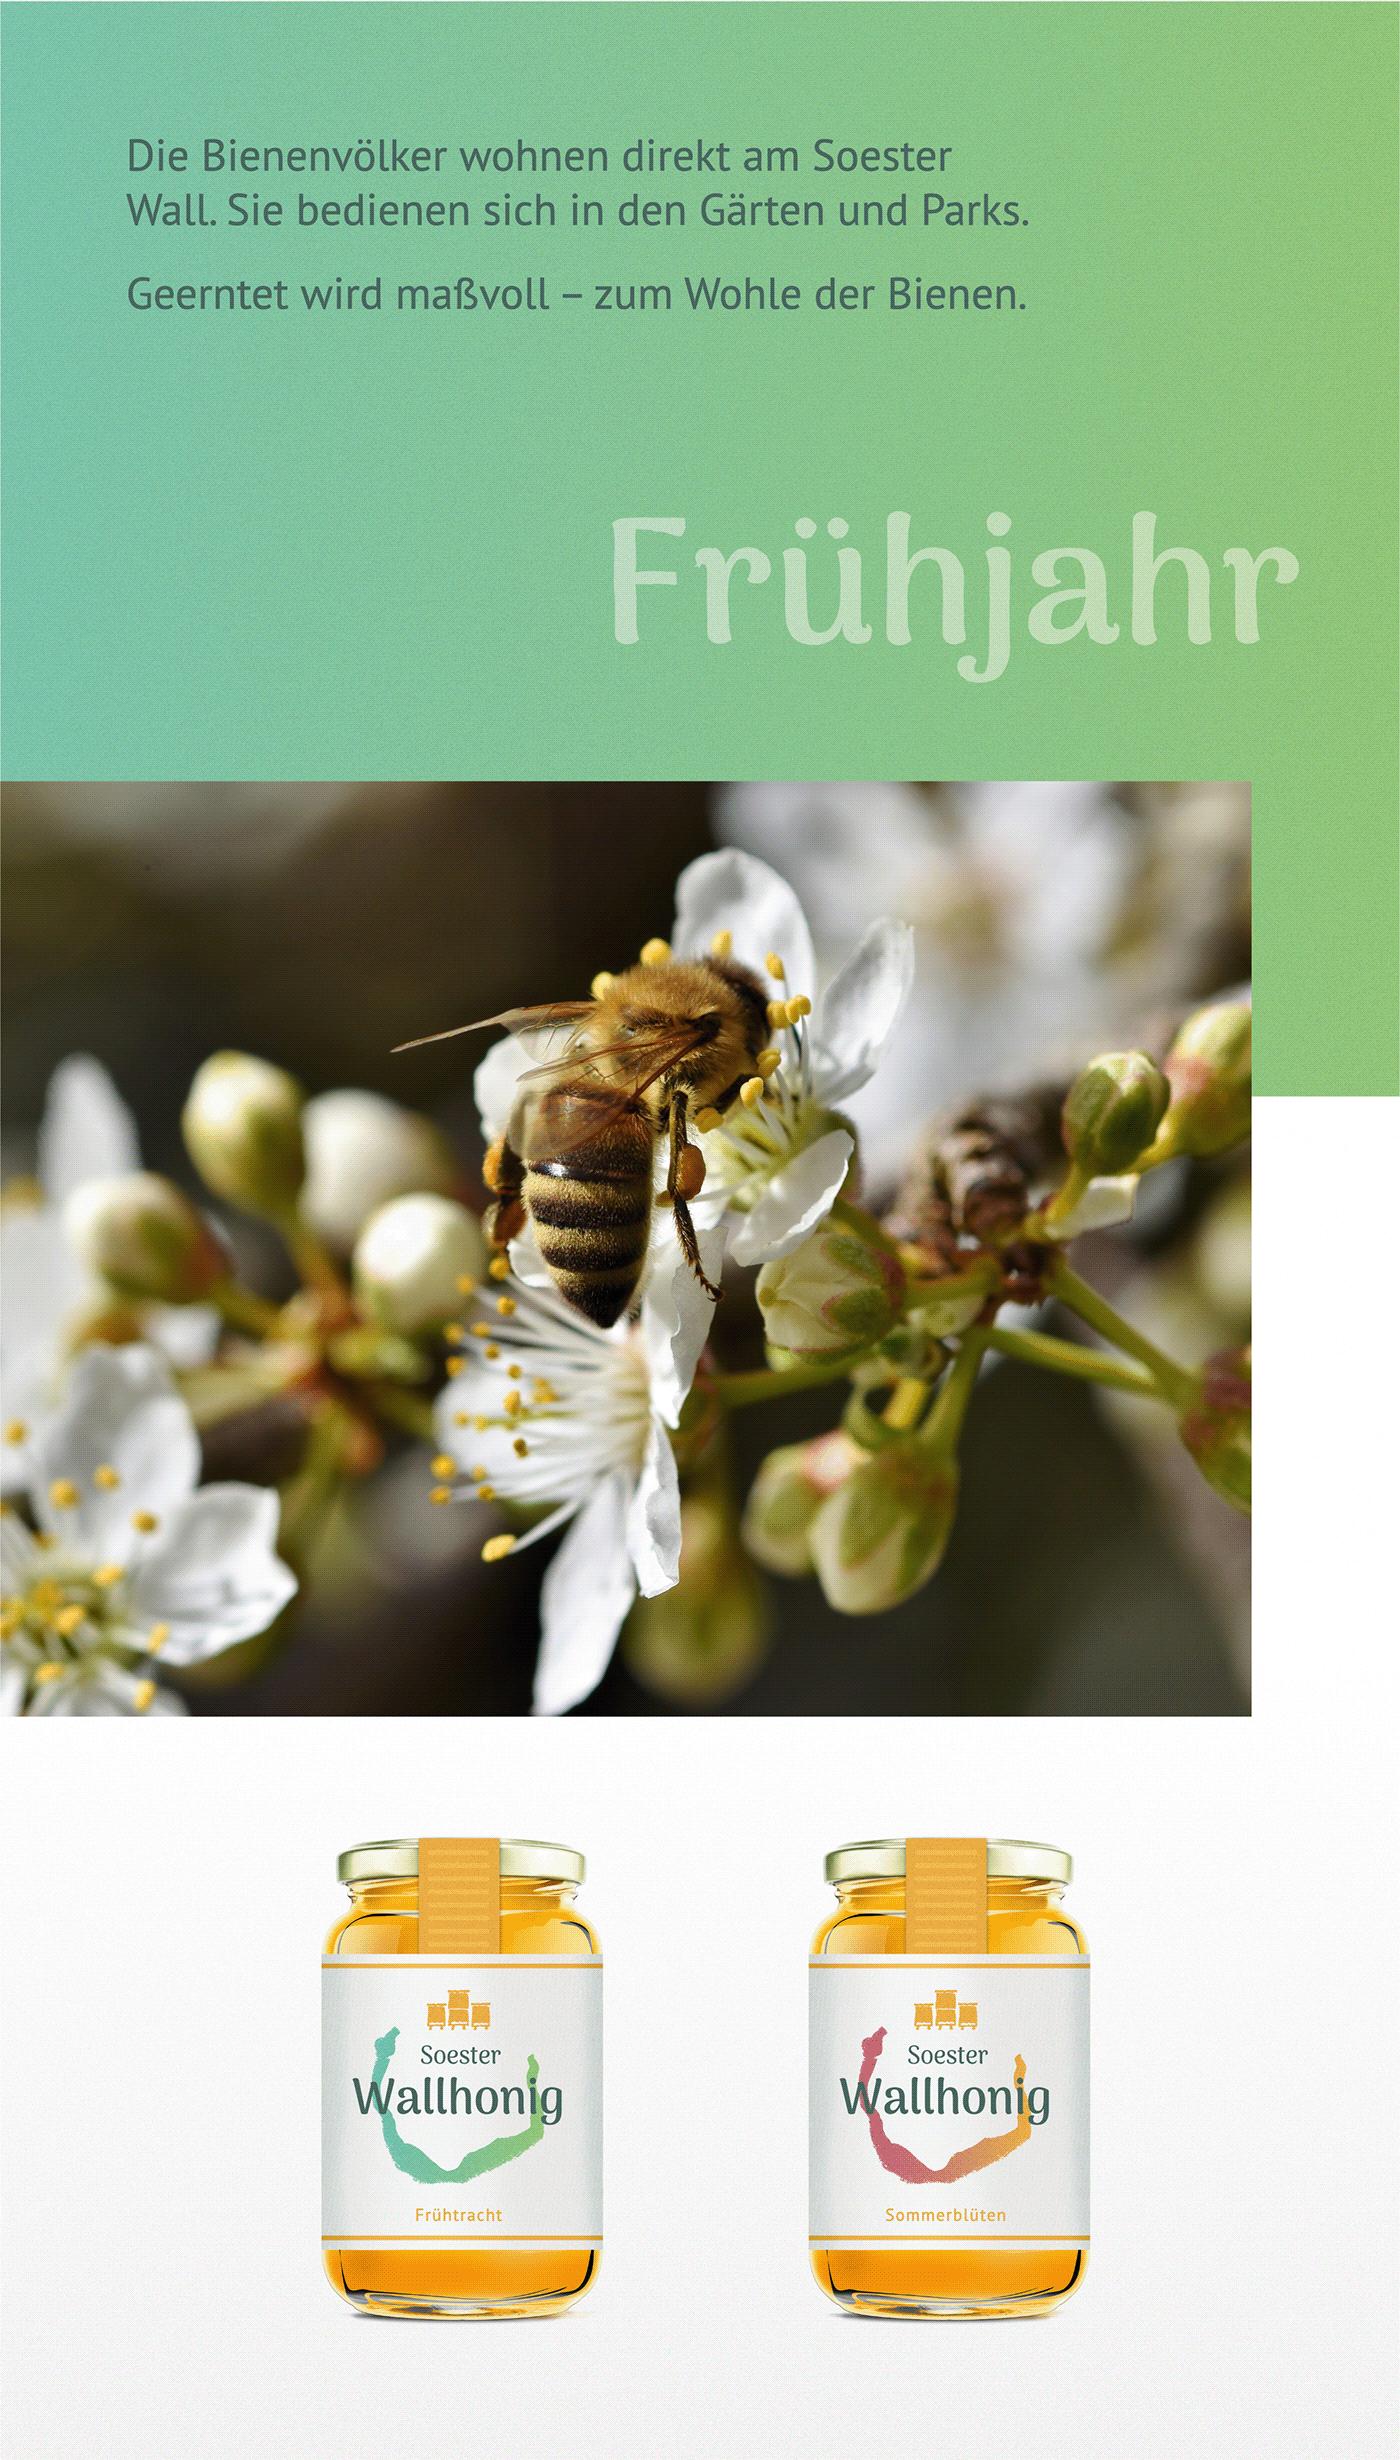 flower with a honeybee